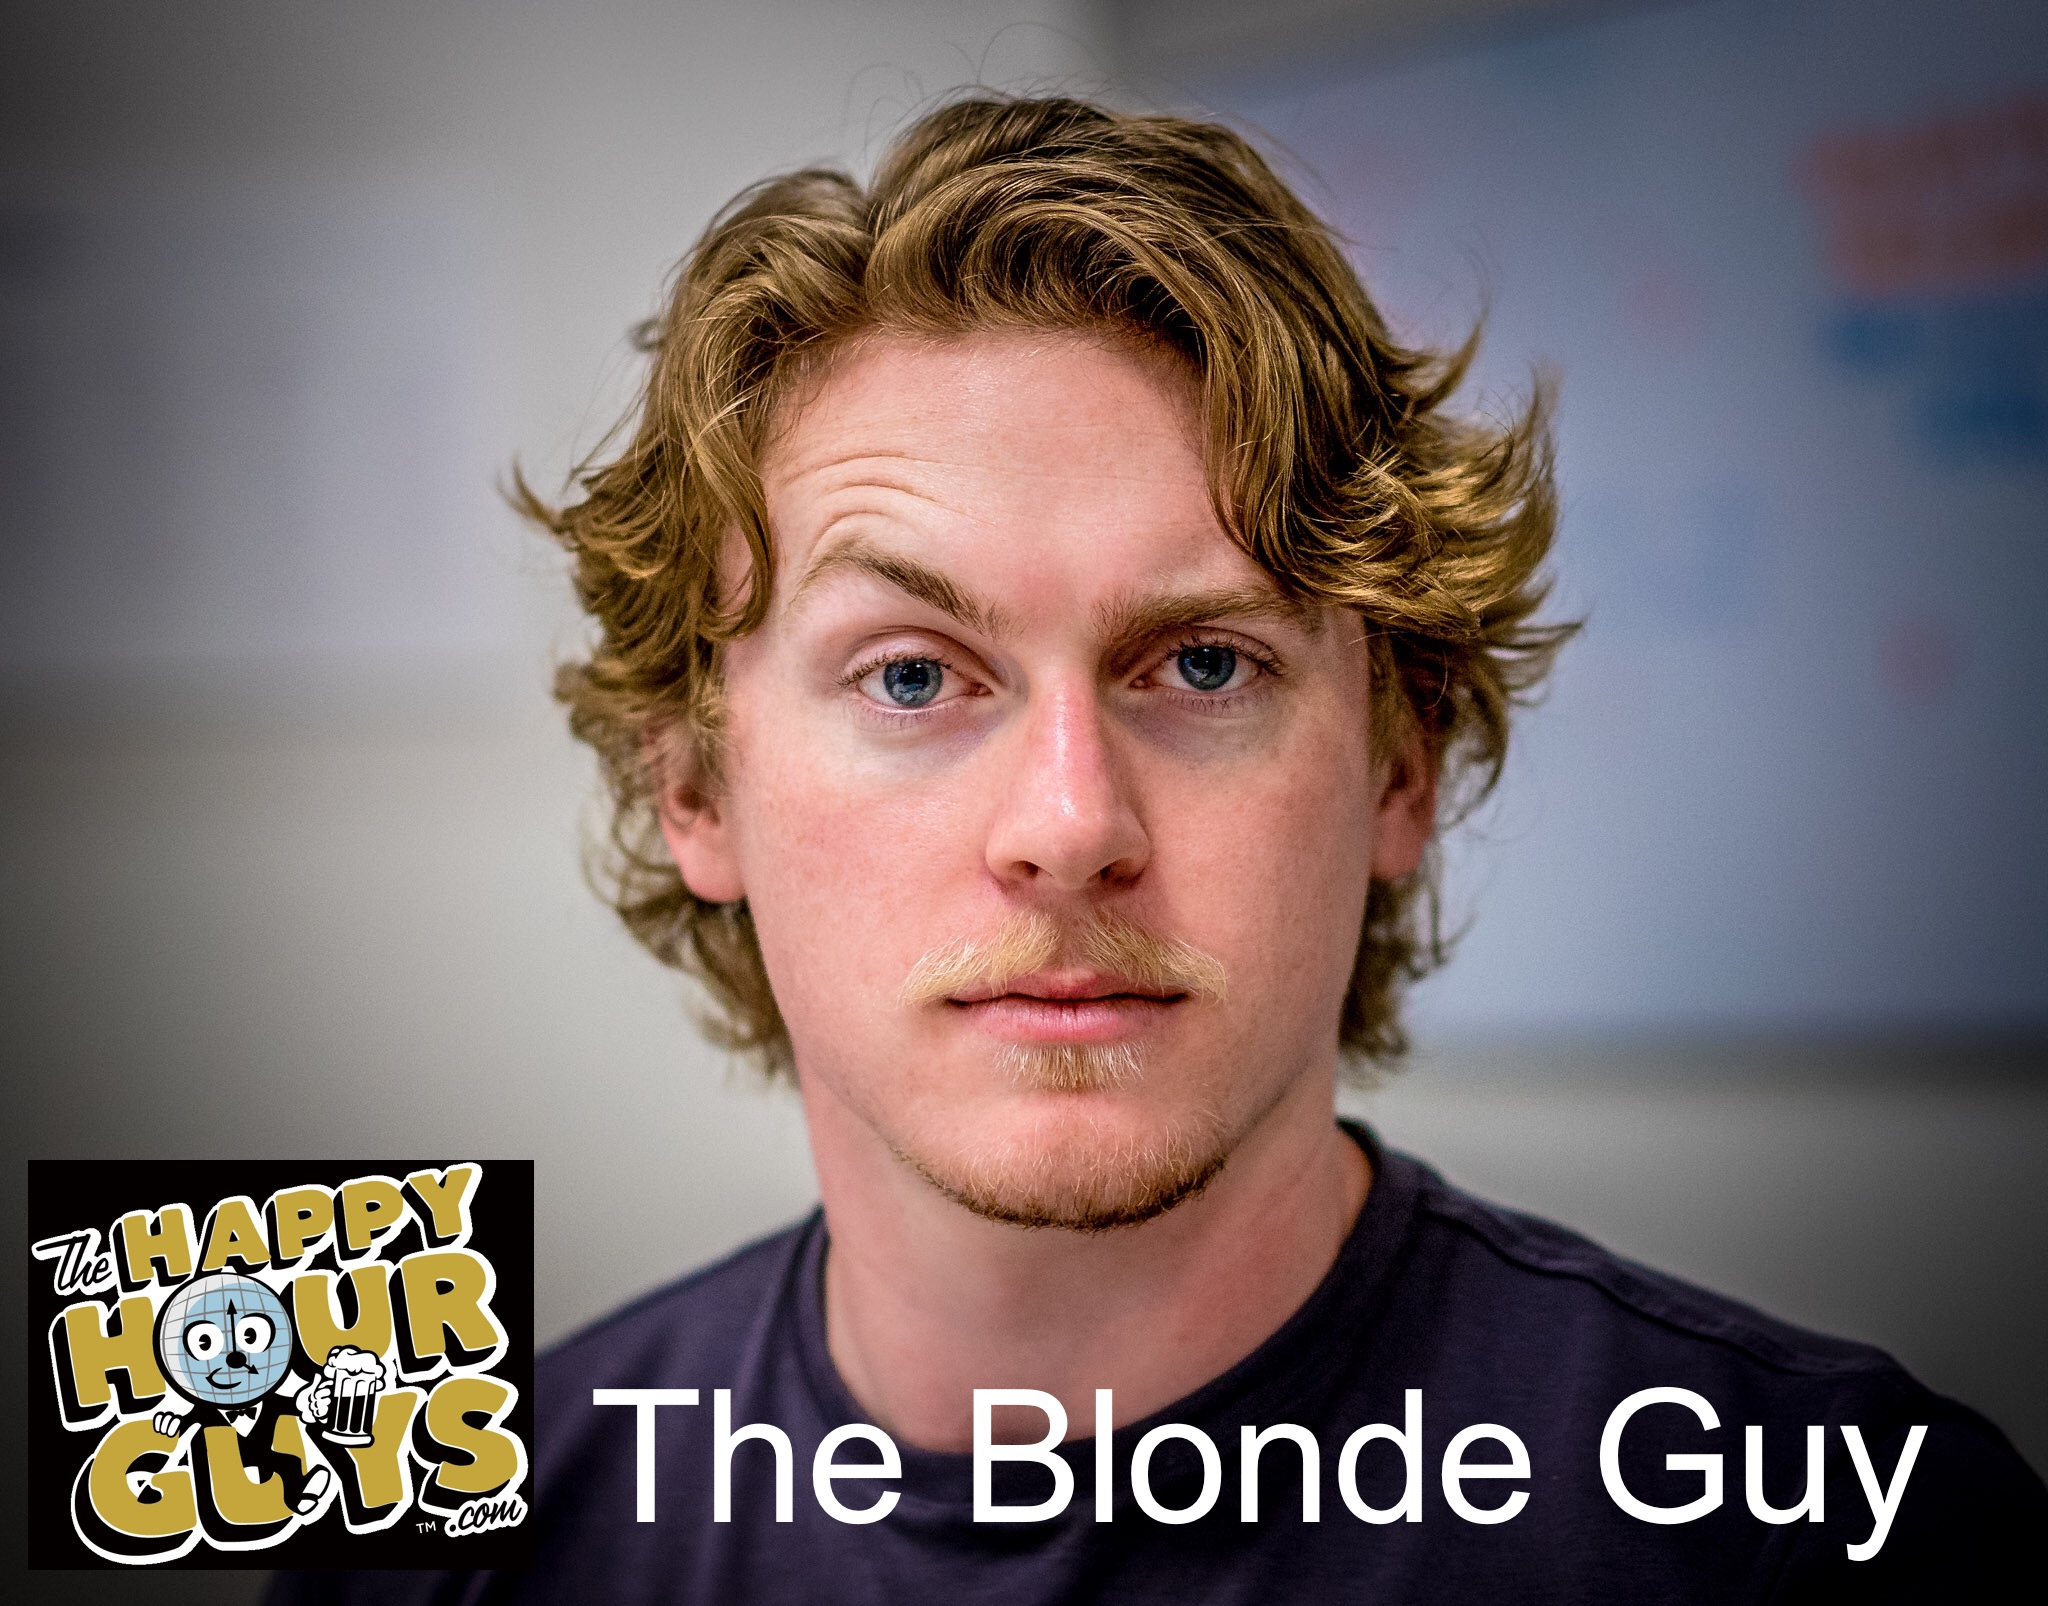 Tim Heller, The Blonde Guy